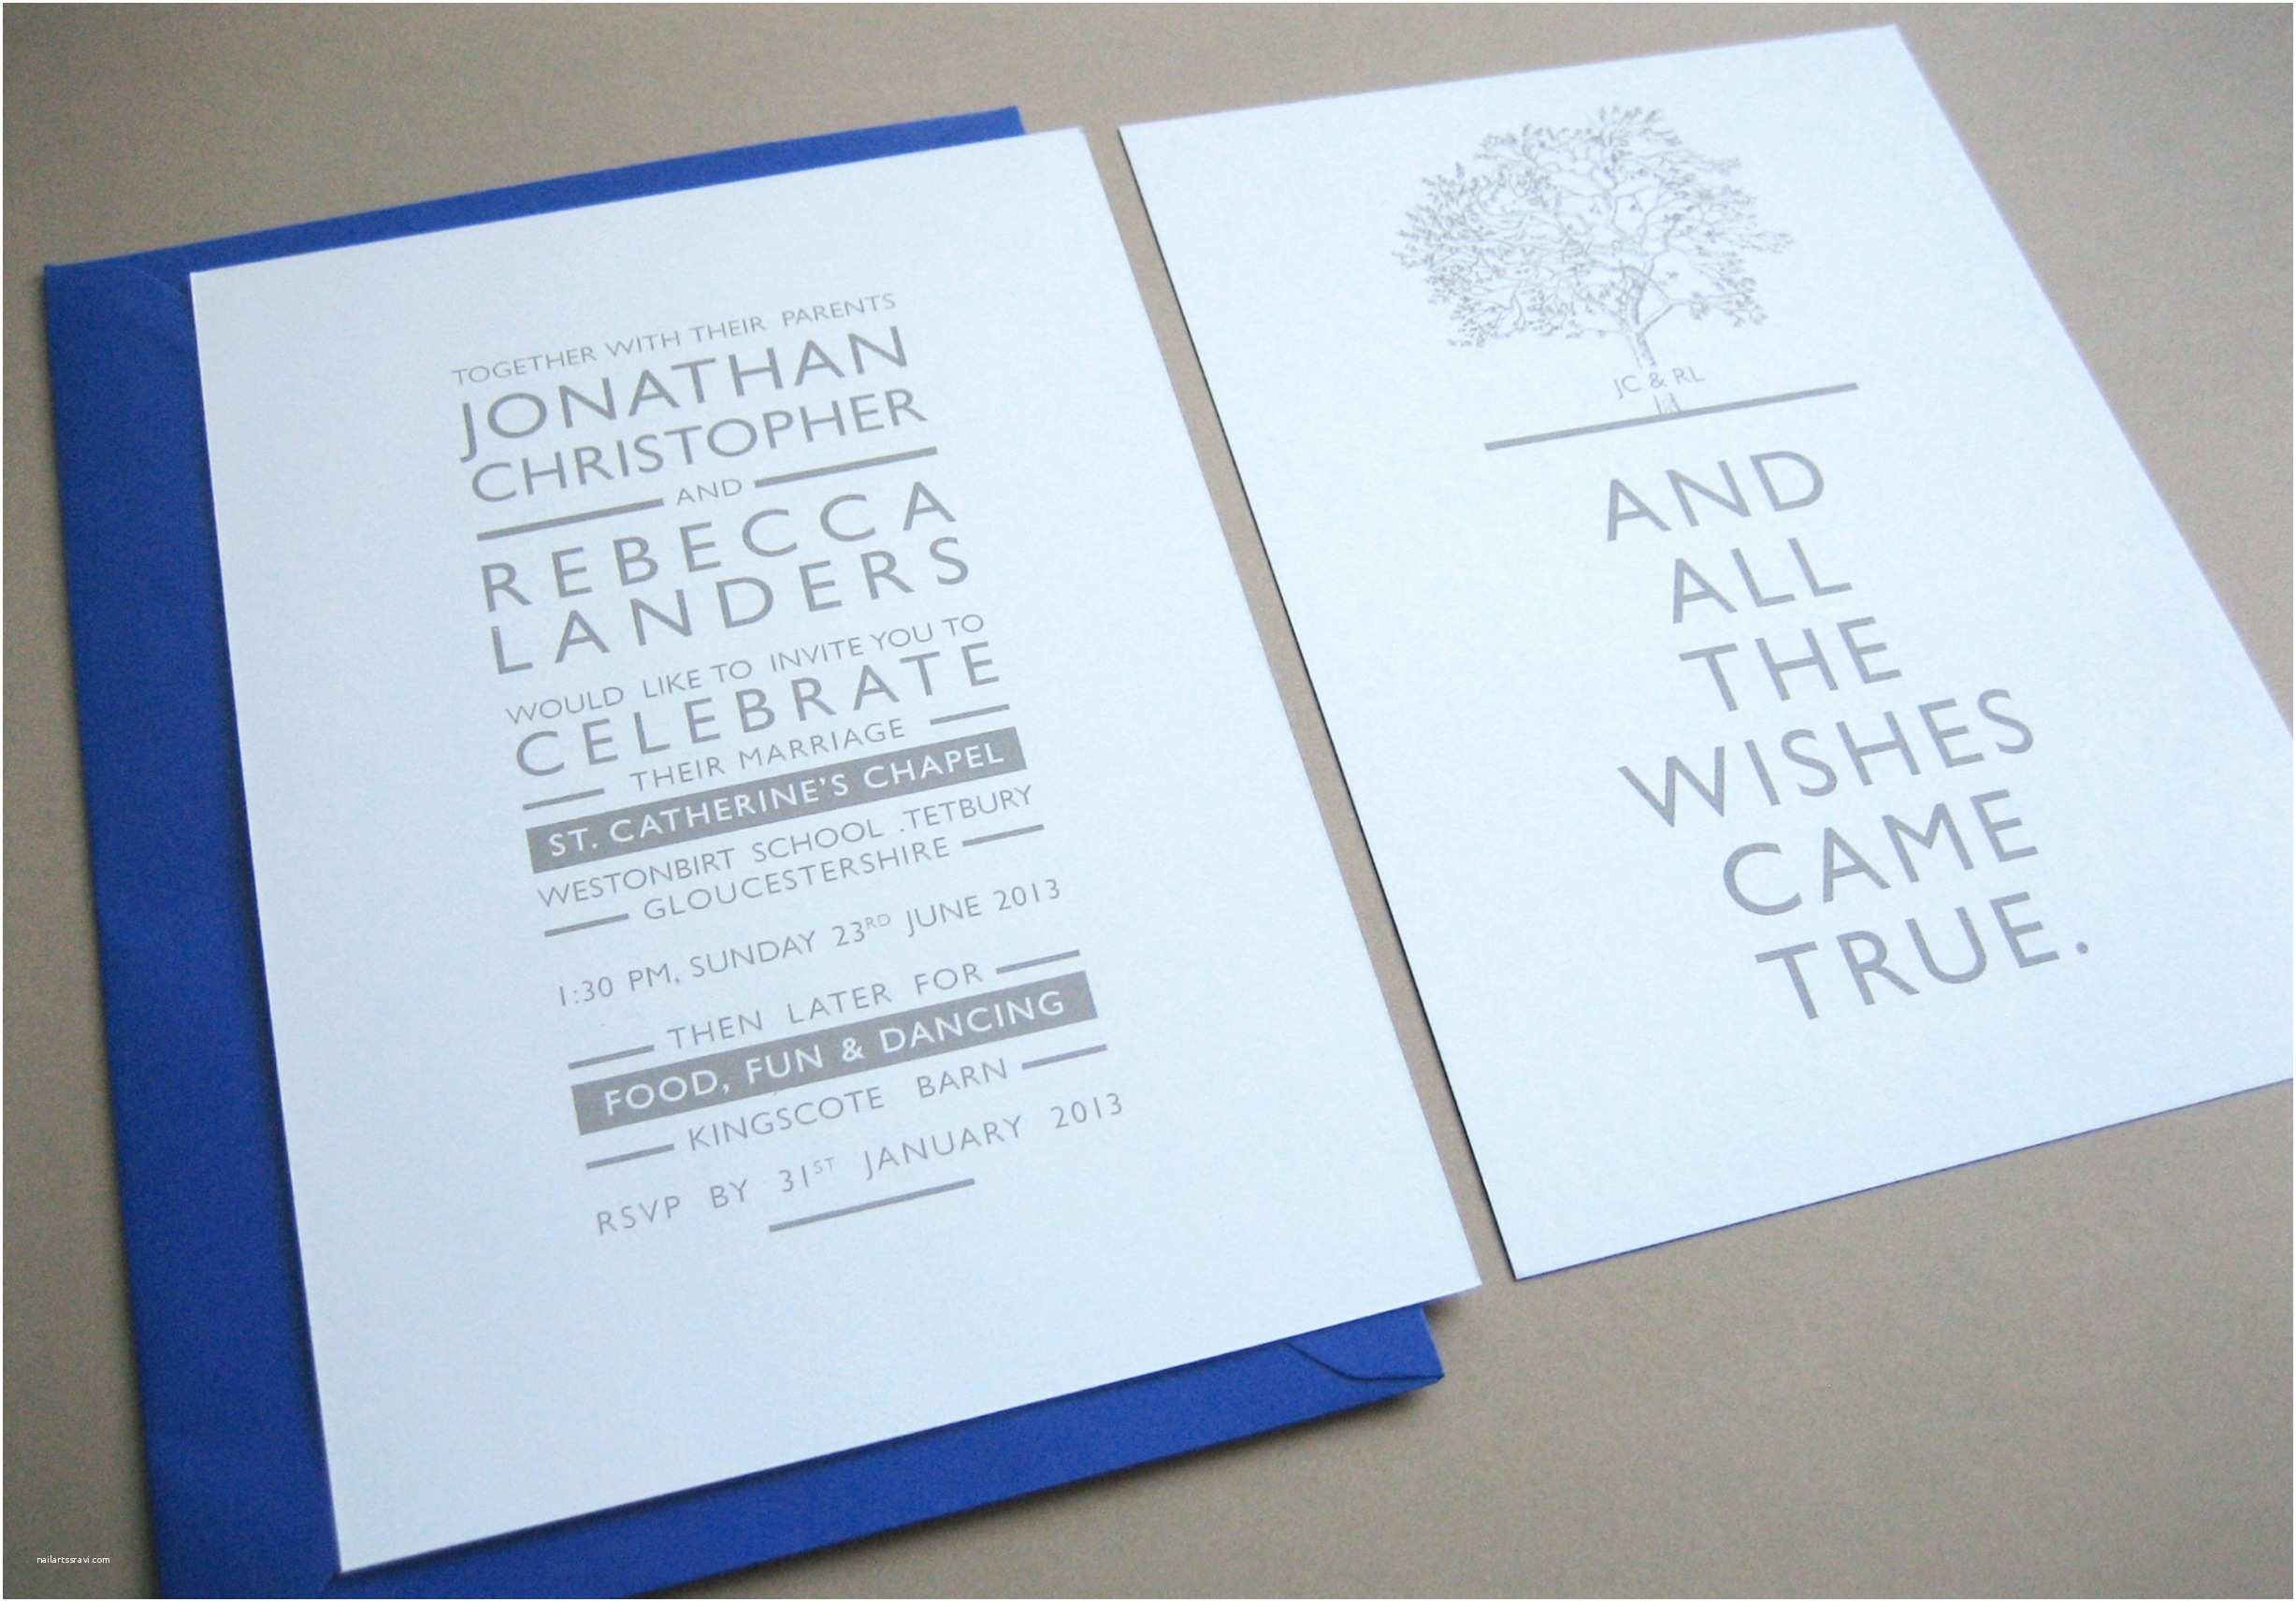 Printing Wedding Invitations at Kinkos Wedding Invitation Printing Image Collections Wedding